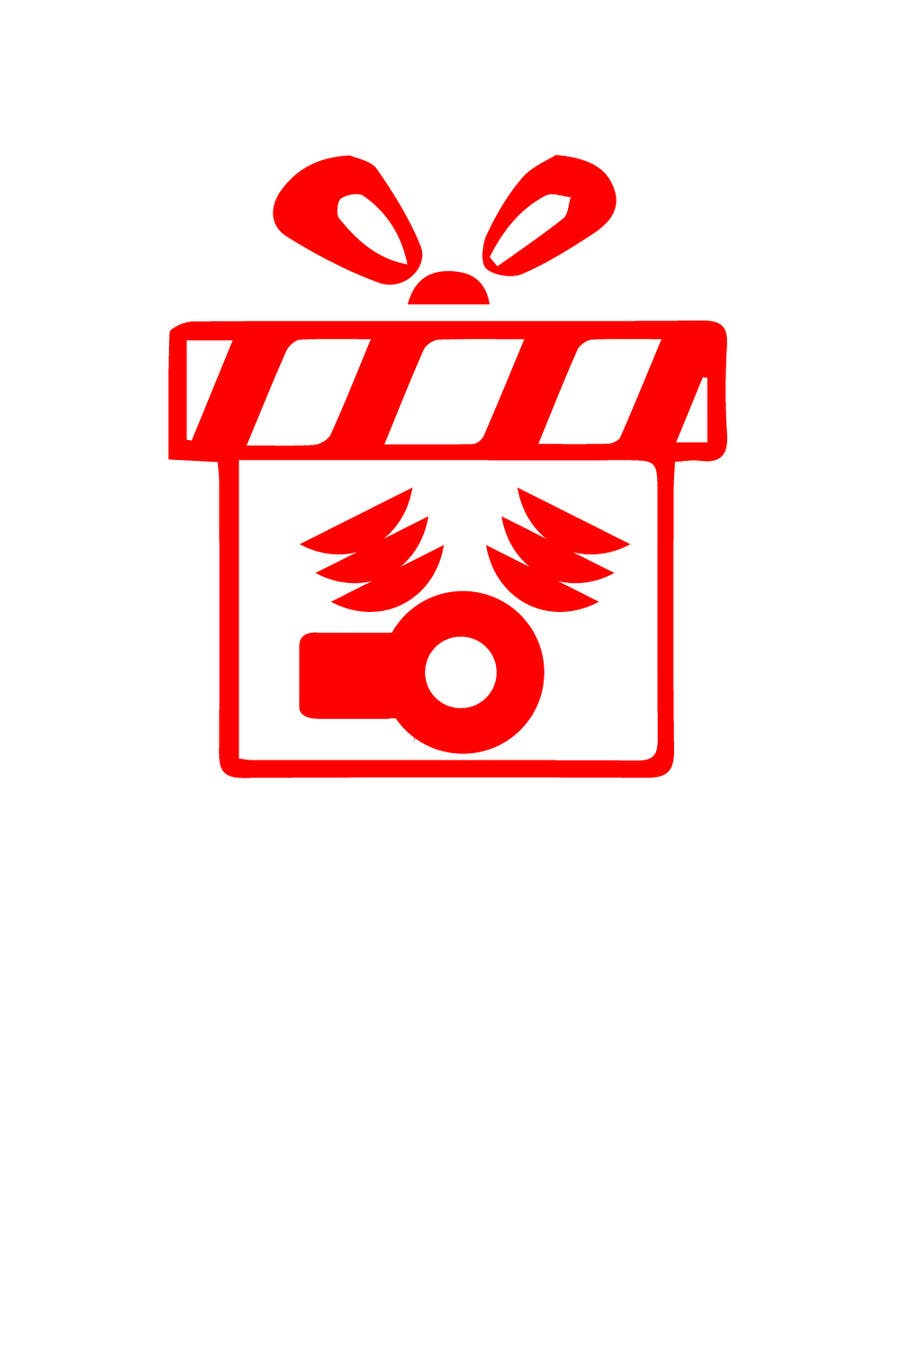 Bài tham dự cuộc thi #                                        67                                      cho                                         Design a Logo for an online motorcycle parts company